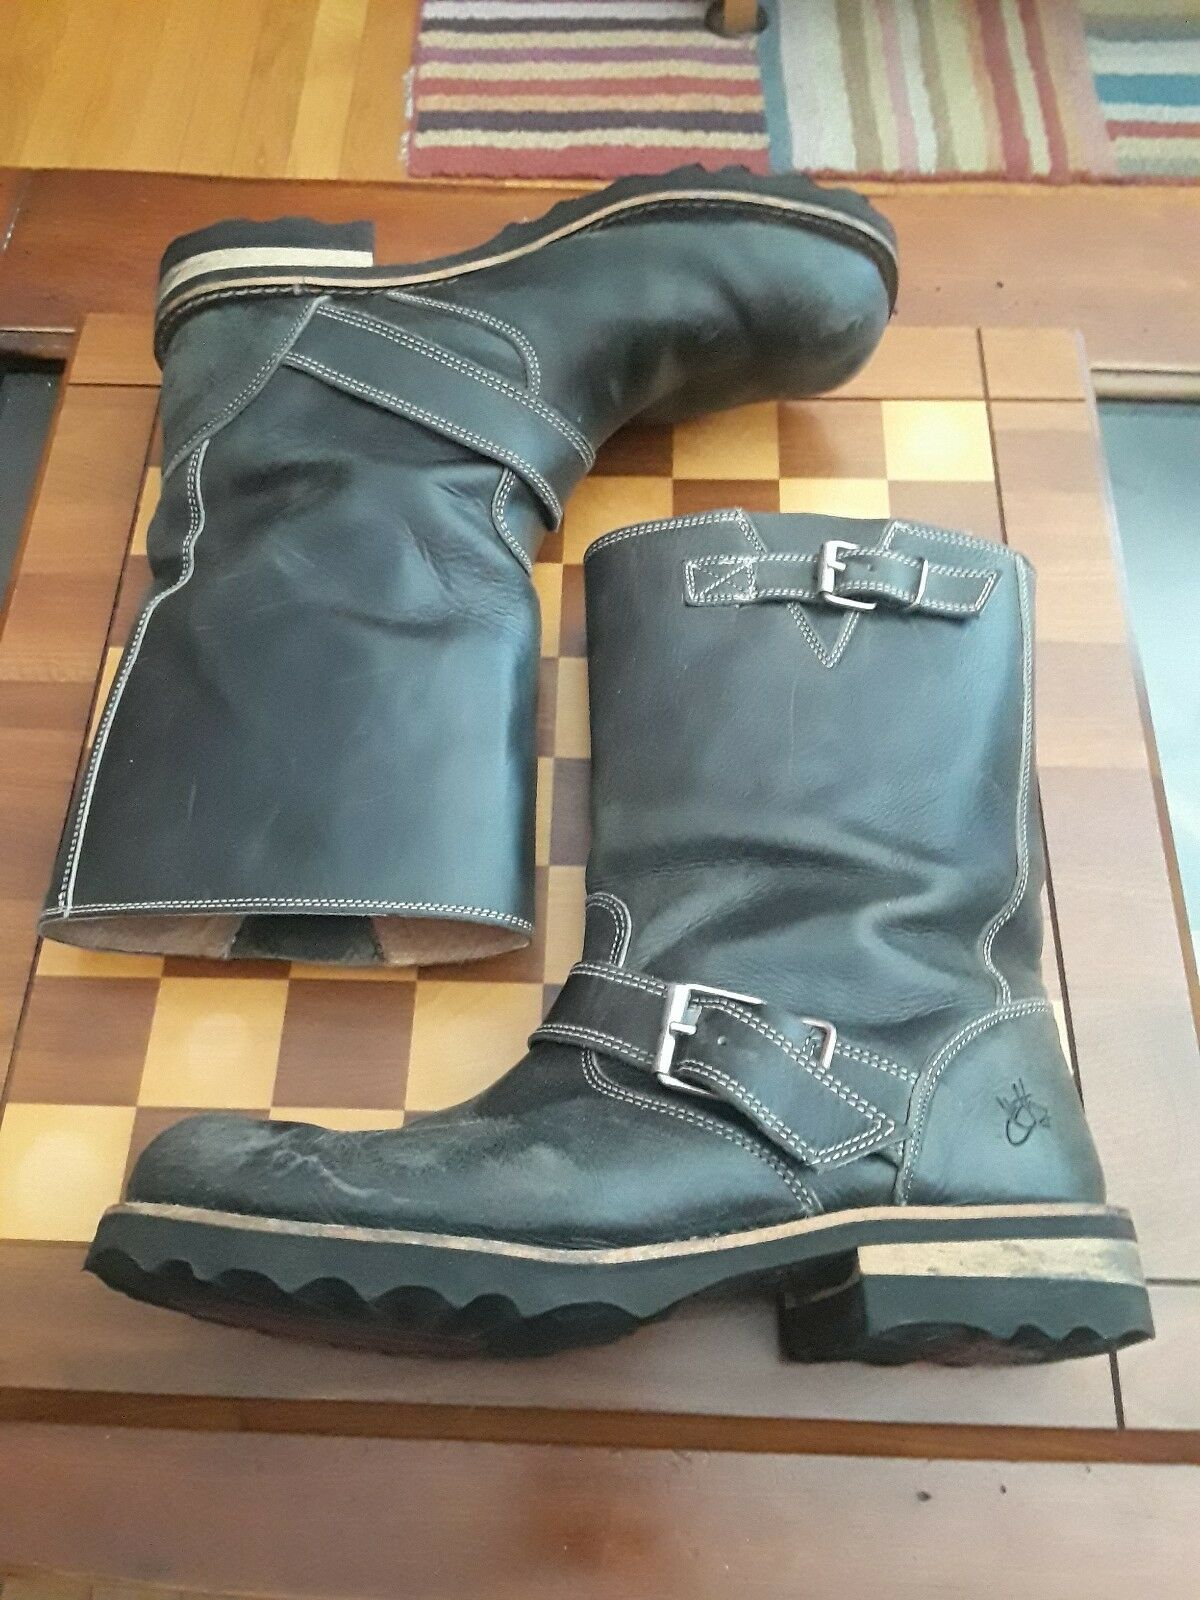 John fluevog F Bota Grande Grande Grande Ruth Cuero Negro botas Mitad de Pantorrilla EE. UU. 11 Reino Unido 9  precio razonable